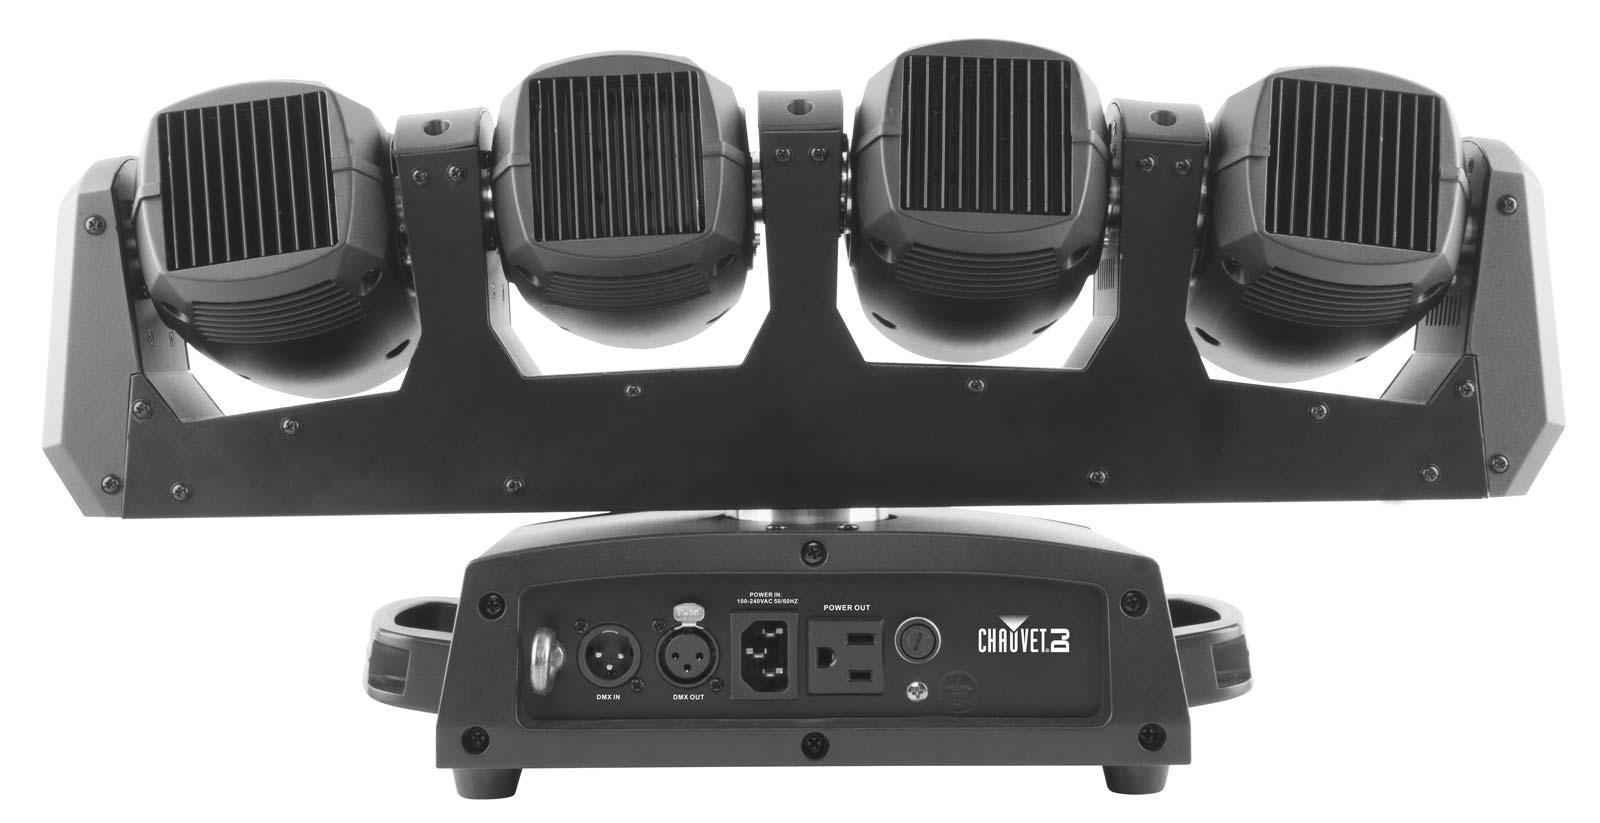 chauvet dj intimidator wave 360 irc rotating 4 head moving light array agiprodj. Black Bedroom Furniture Sets. Home Design Ideas